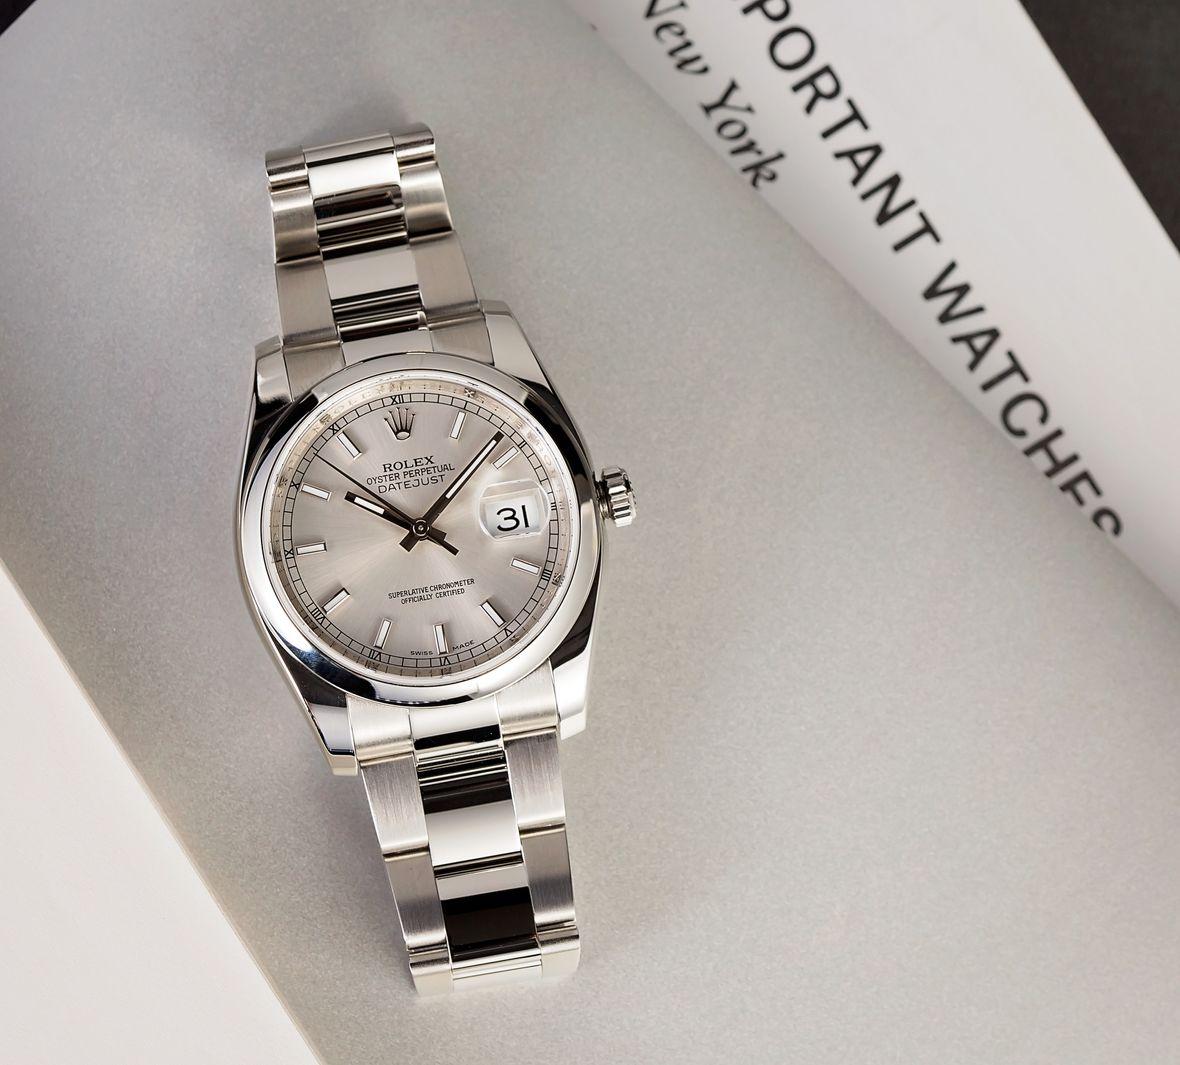 Rolex 116200 Datejust 36 Silver Dial Oyster Bracelet